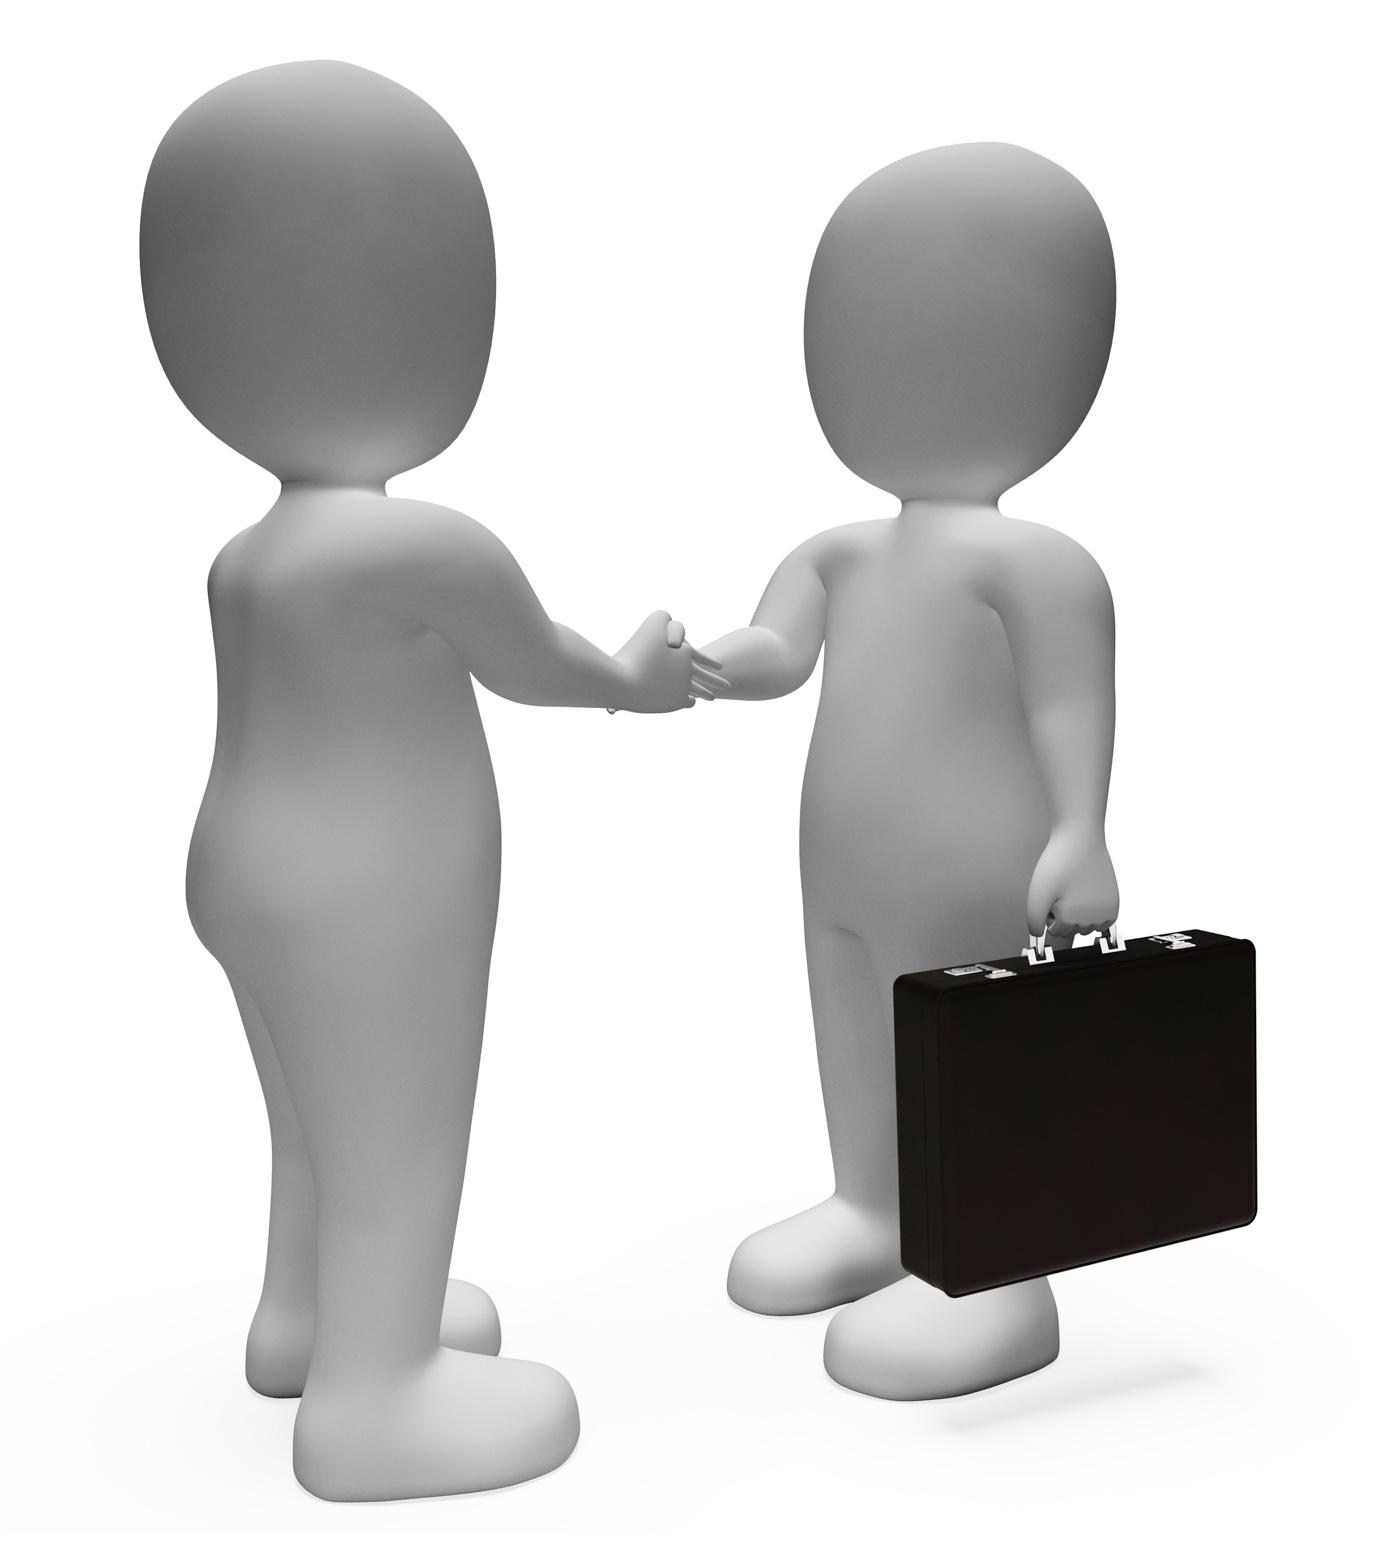 Handshake Businessmen Shows Deal Illustration And Contract 3d Renderin, Partnership, Handshake, Meeting, Men, HQ Photo